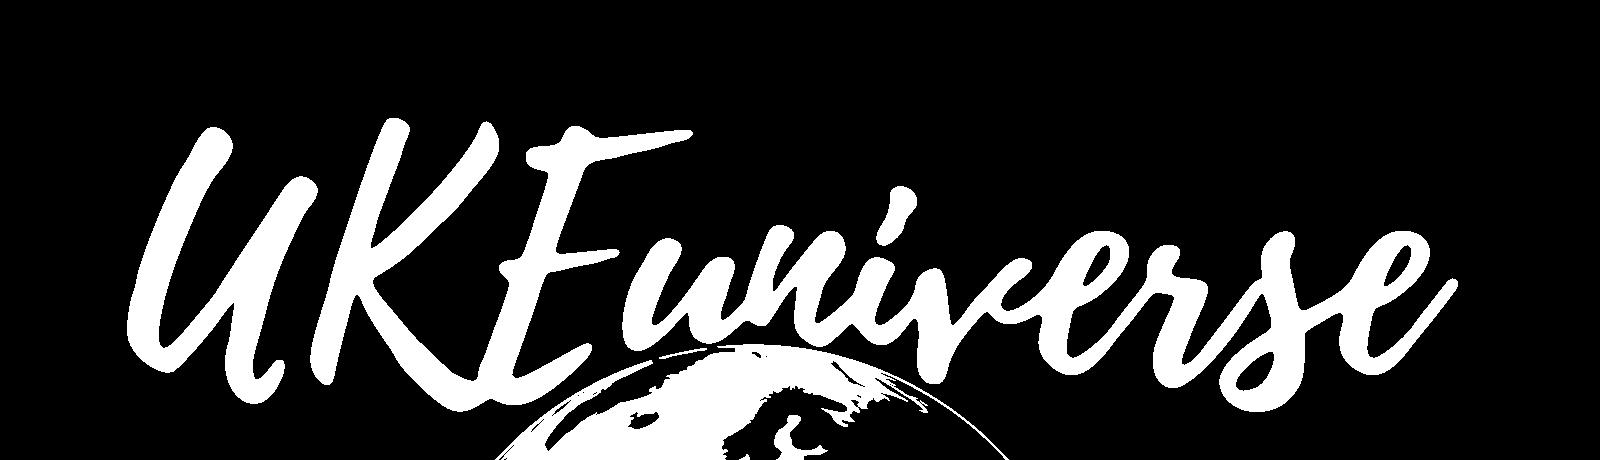 Uke Universe